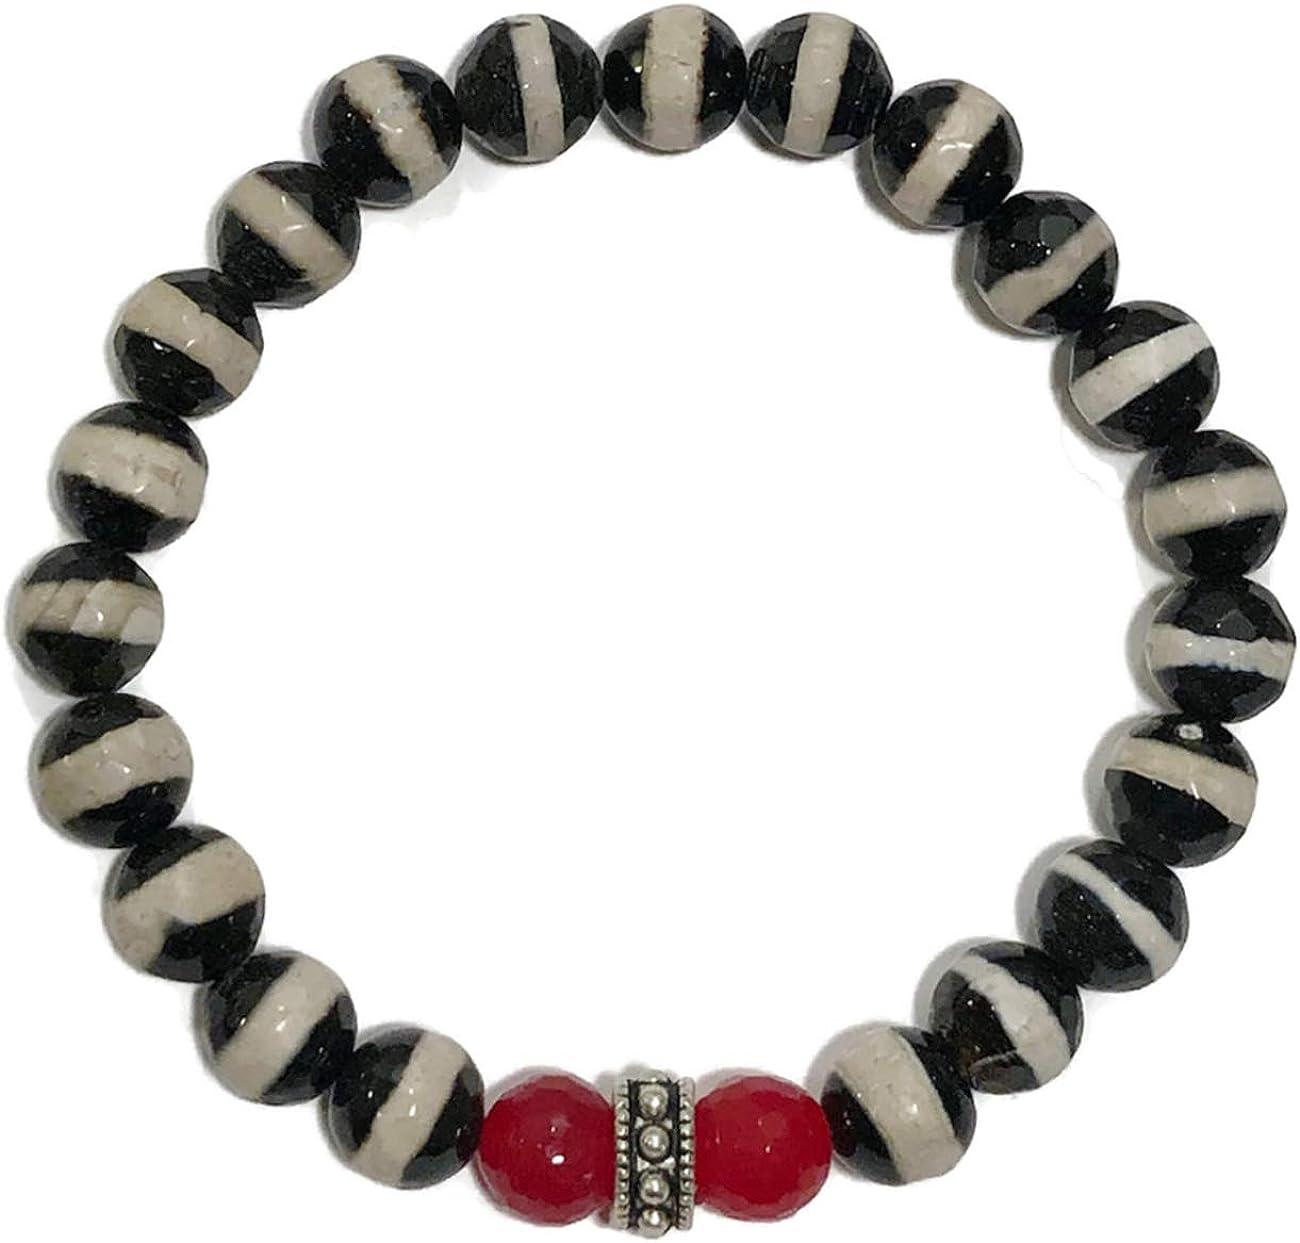 Chakra Yoga Reiki Healing Energy Zen Meditation Jewelry Good Luck: Tibetan dZi Agate Wellness Self-Care Bracelets Red Jade KarmaArm Lucky Bracelet